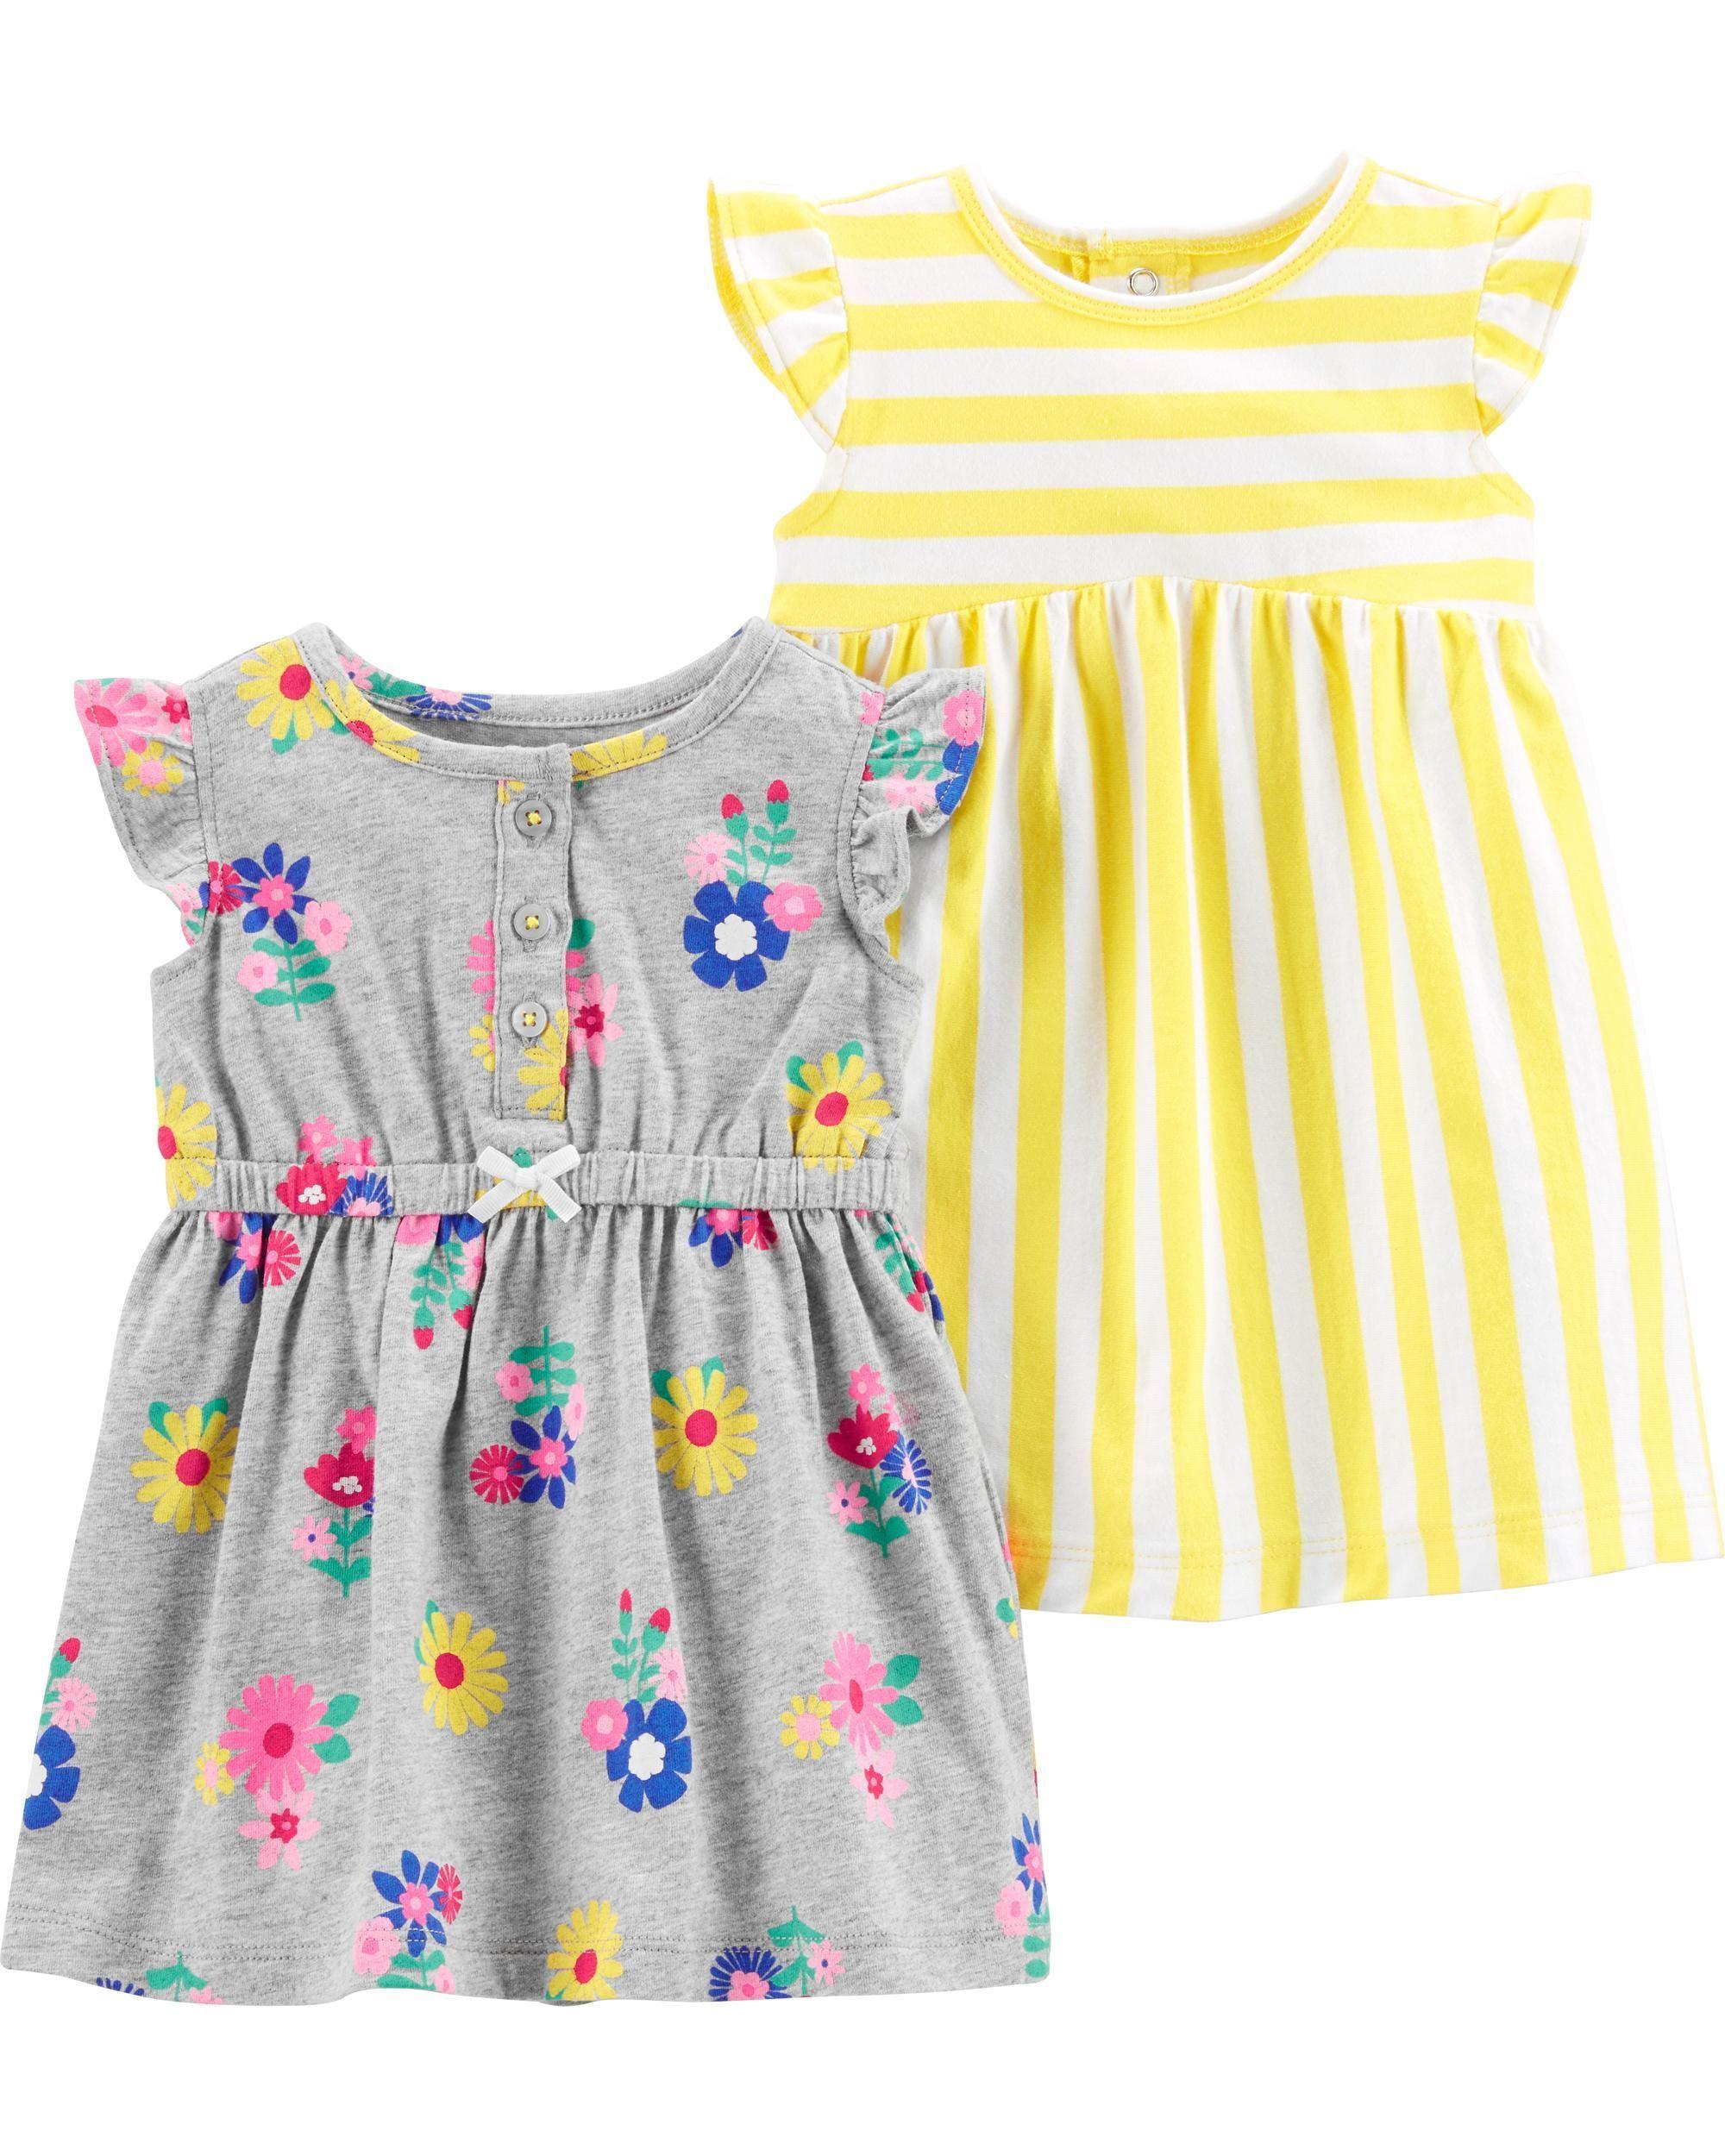 Details about  /2PCS baby Girls outfits stripe Tops Condole belt dress kid Girls Clothes set